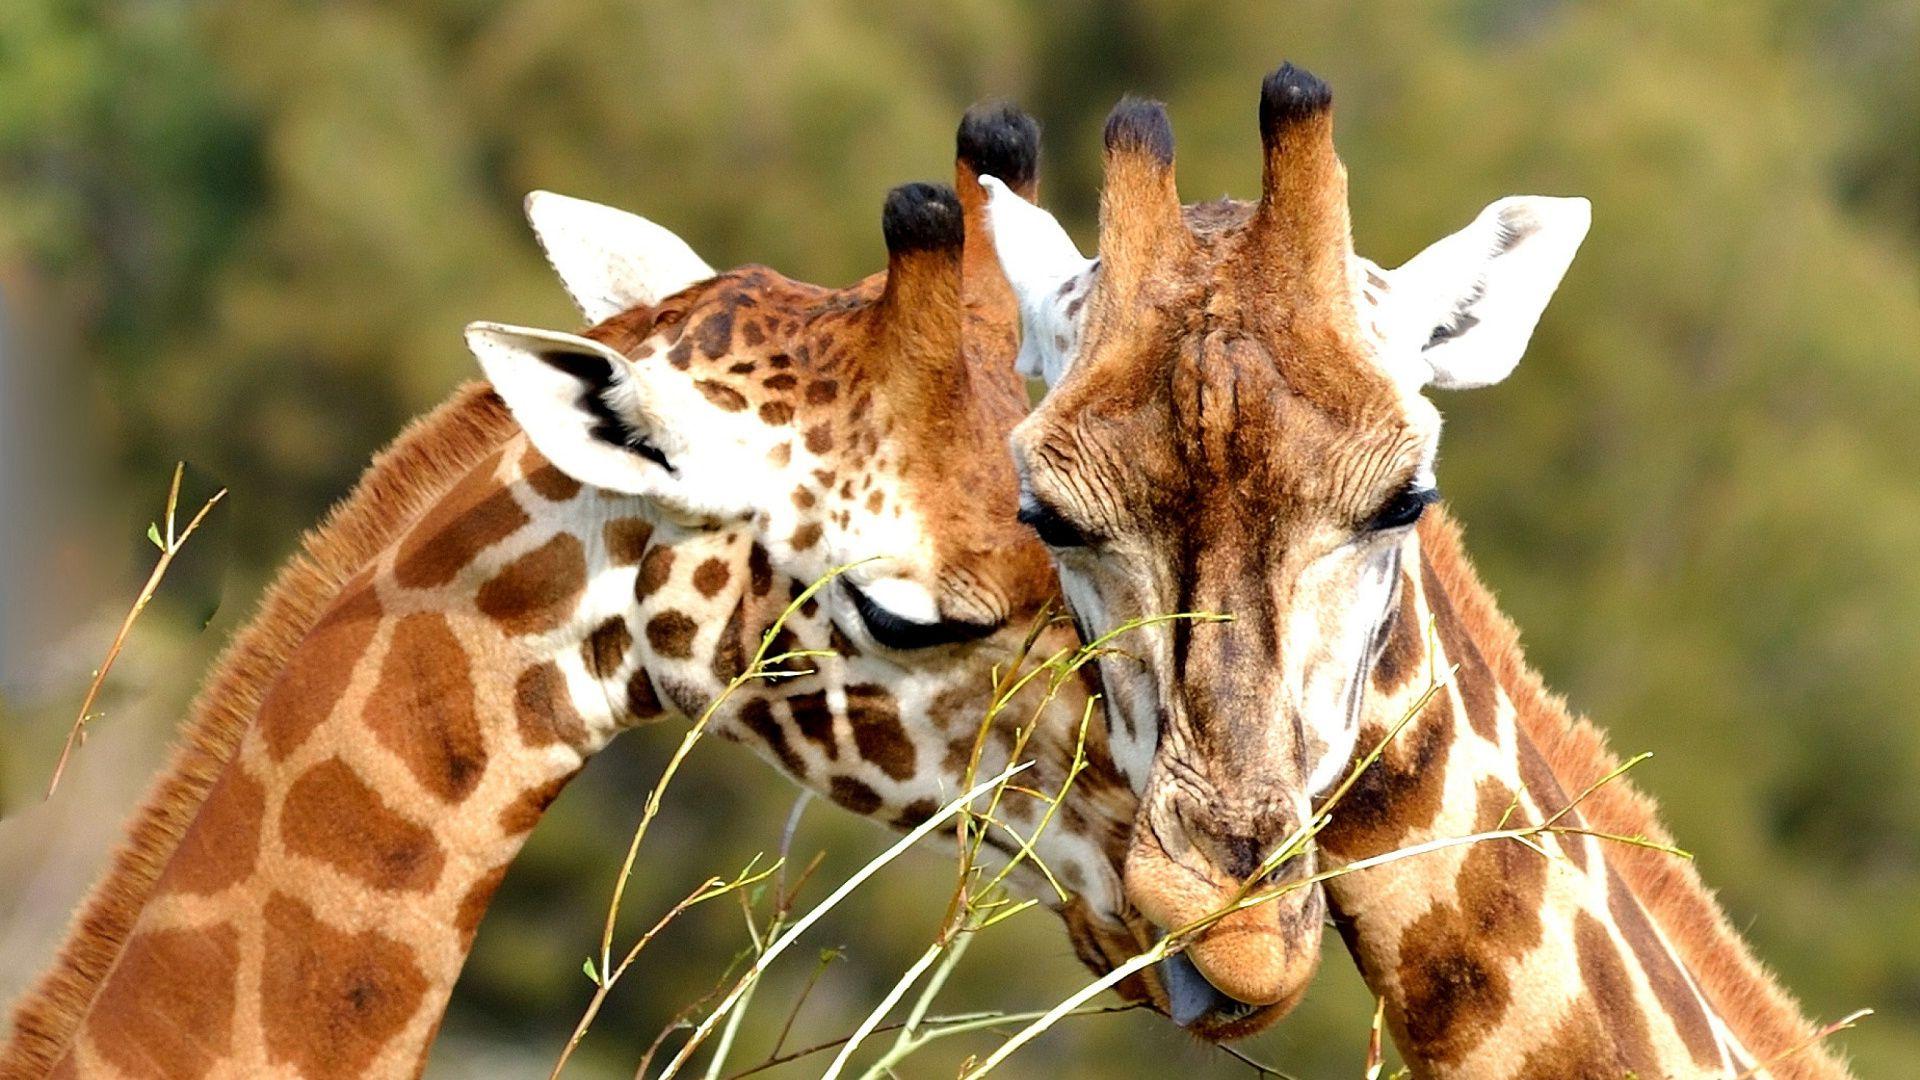 Giraffes Hugging